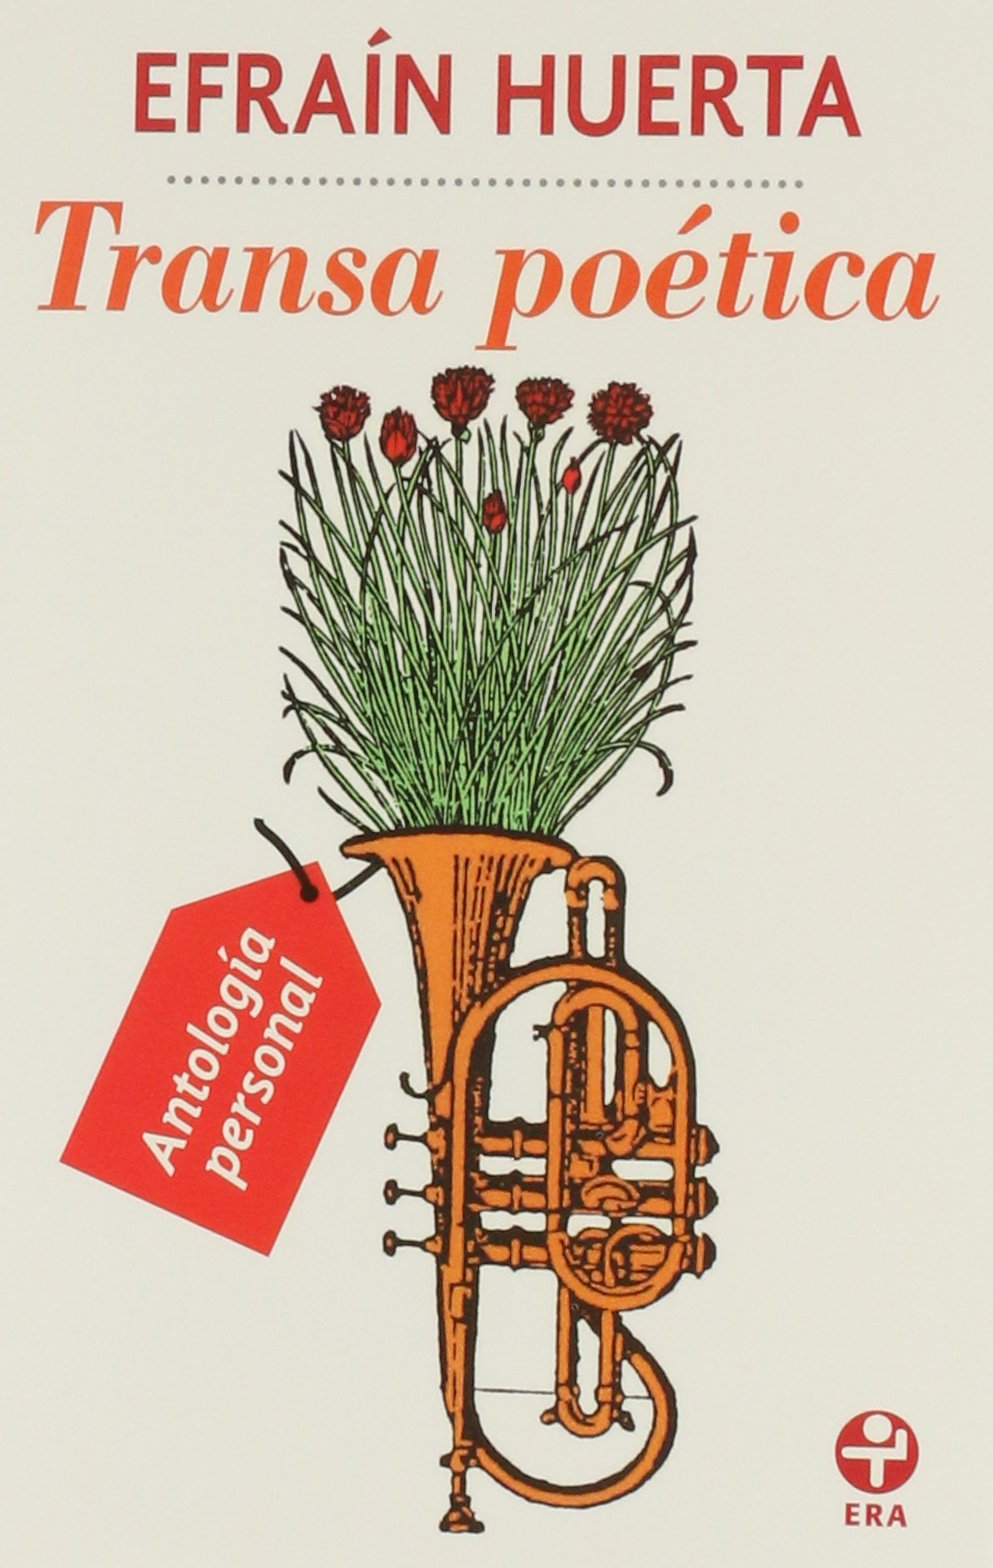 Transa poética (Spanish Edition)